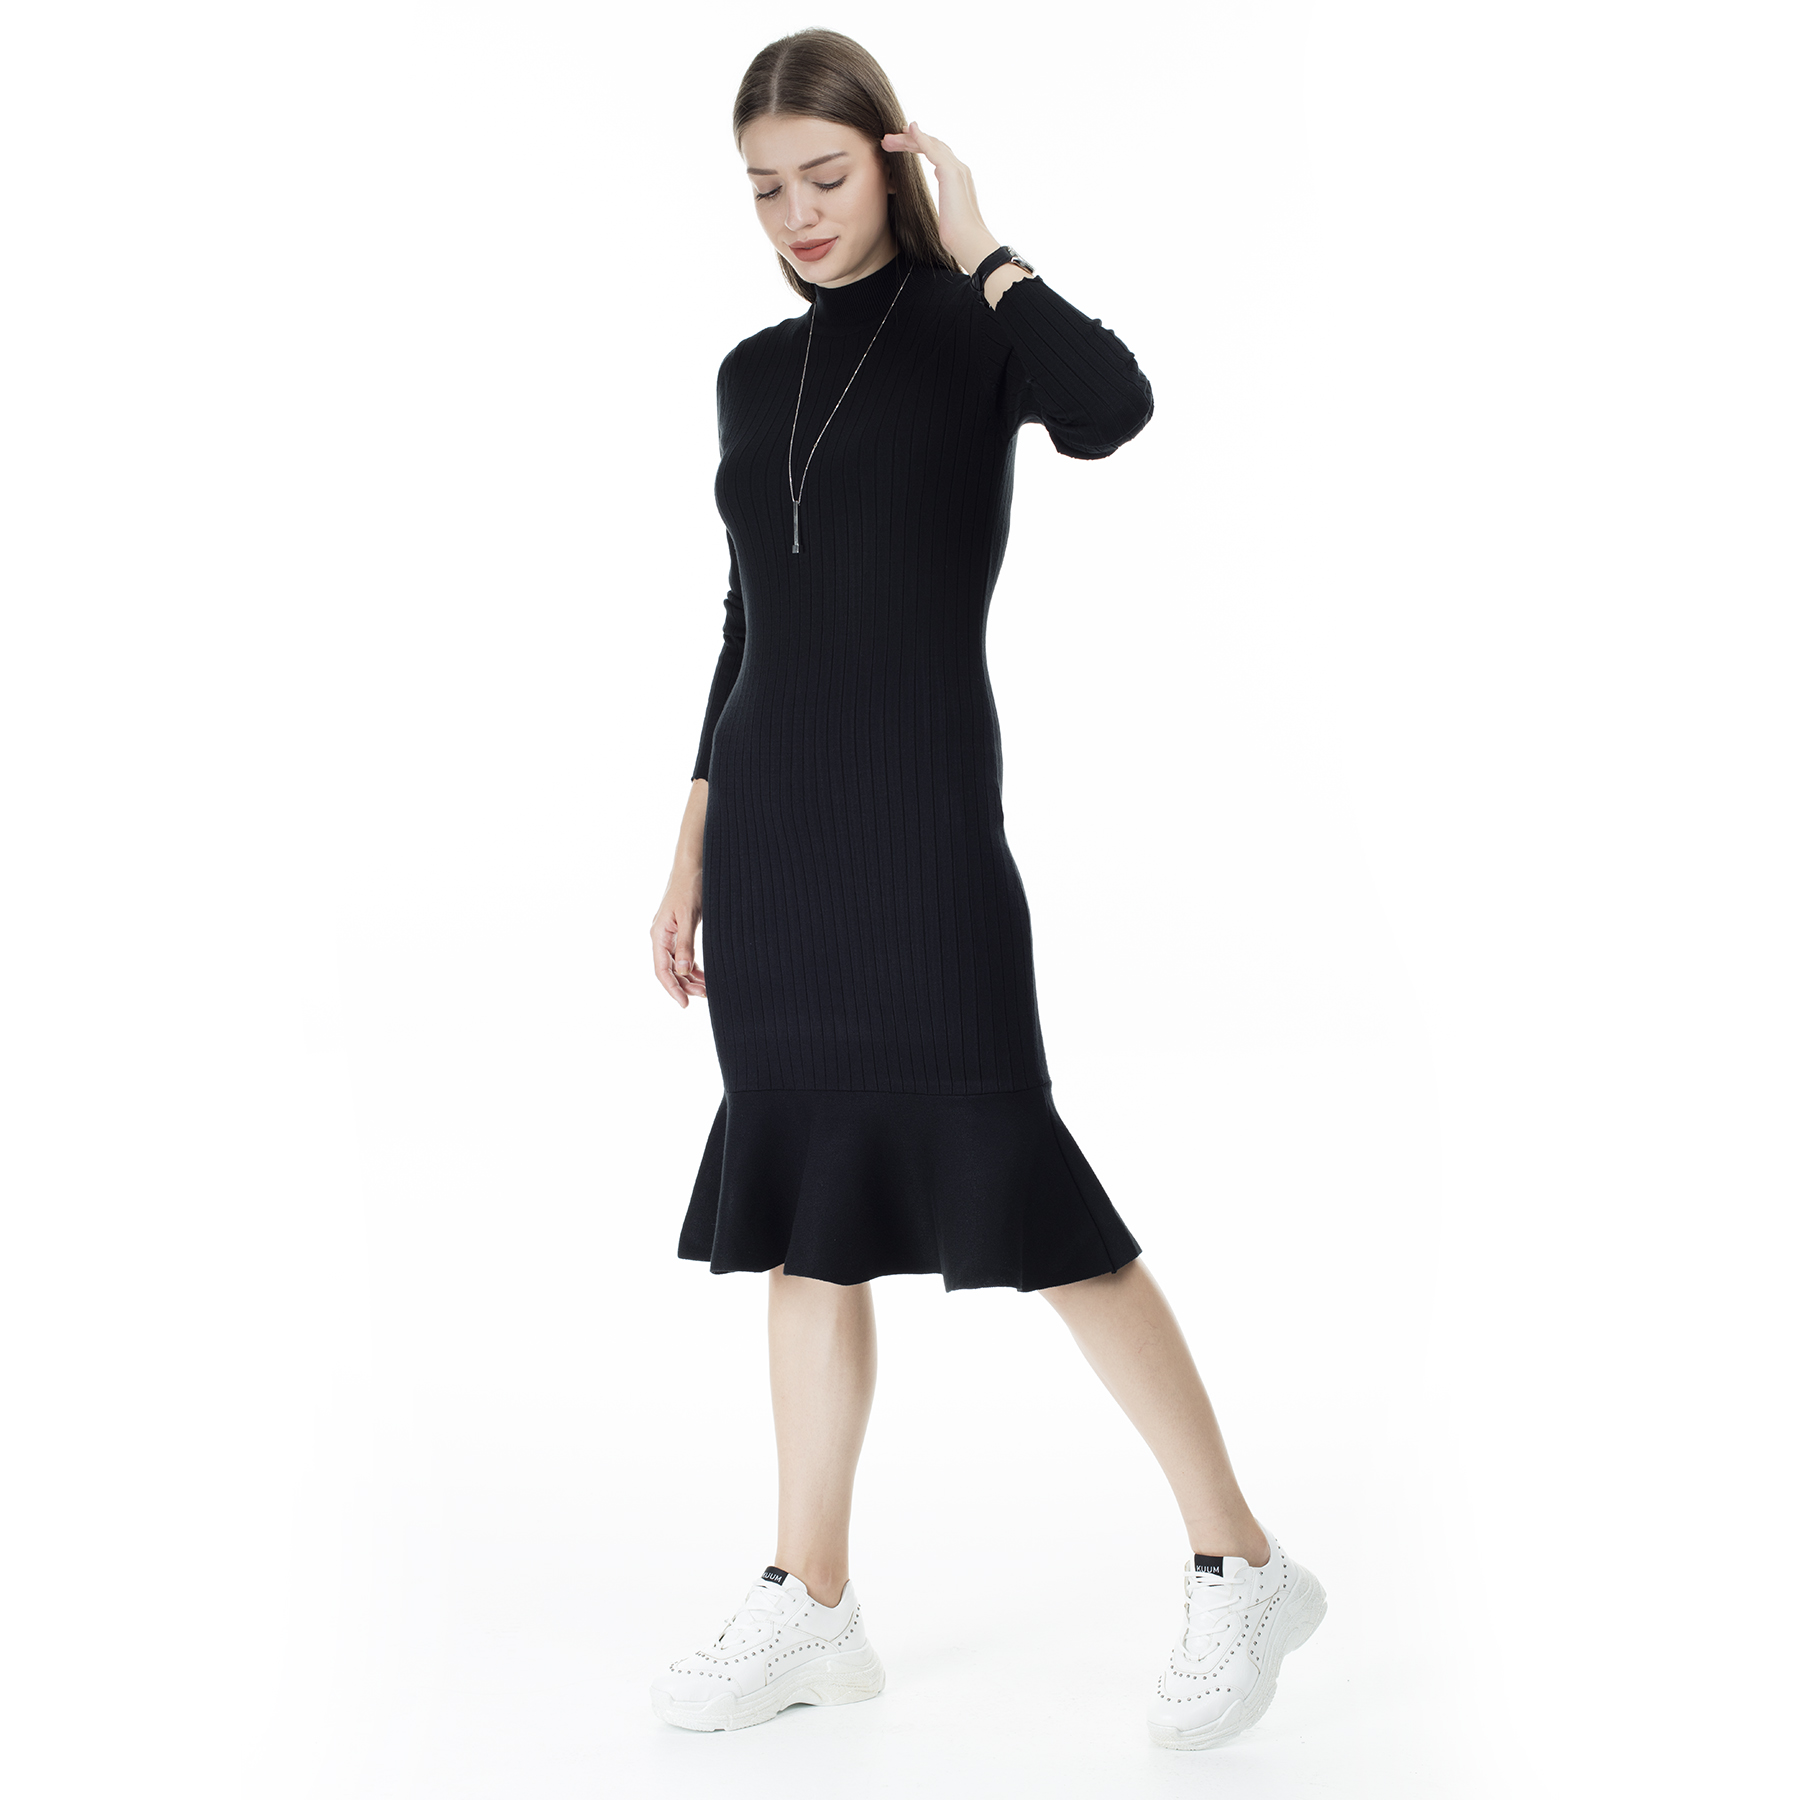 Via Dante Skirt Ruffles Turtleneck Dress WOMEN DRESS 29631120VD